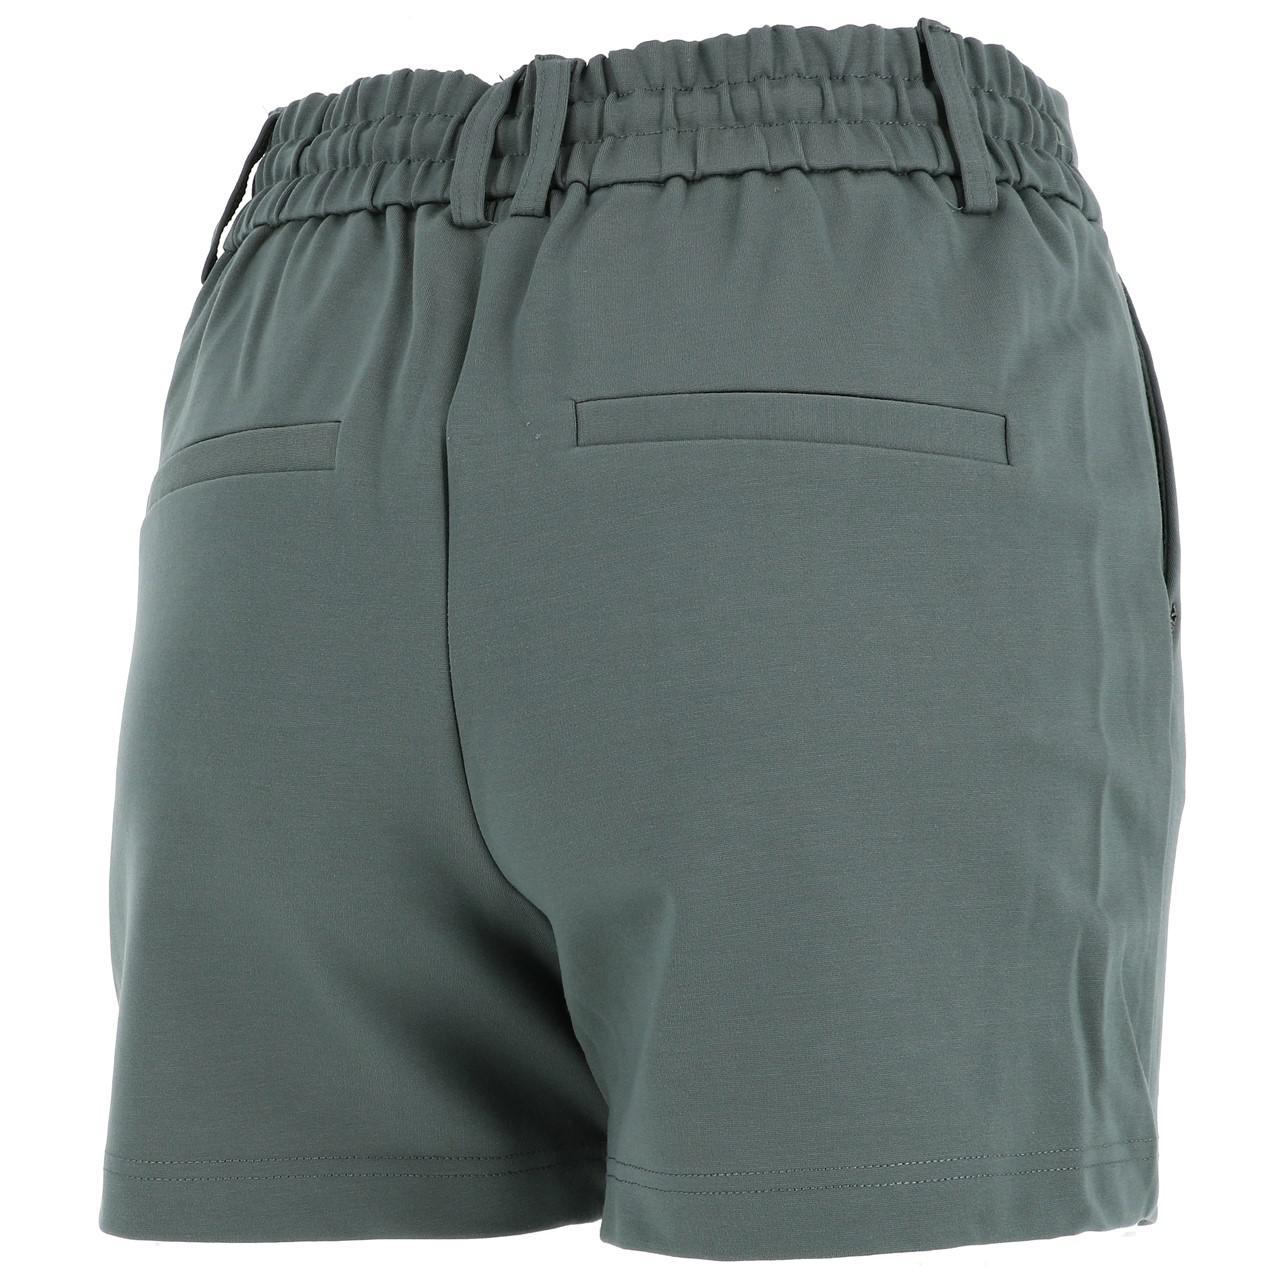 Bermuda-Shorts-Only-Poptrash-Lt-Khaki-Shorts-Green-18701-New thumbnail 5